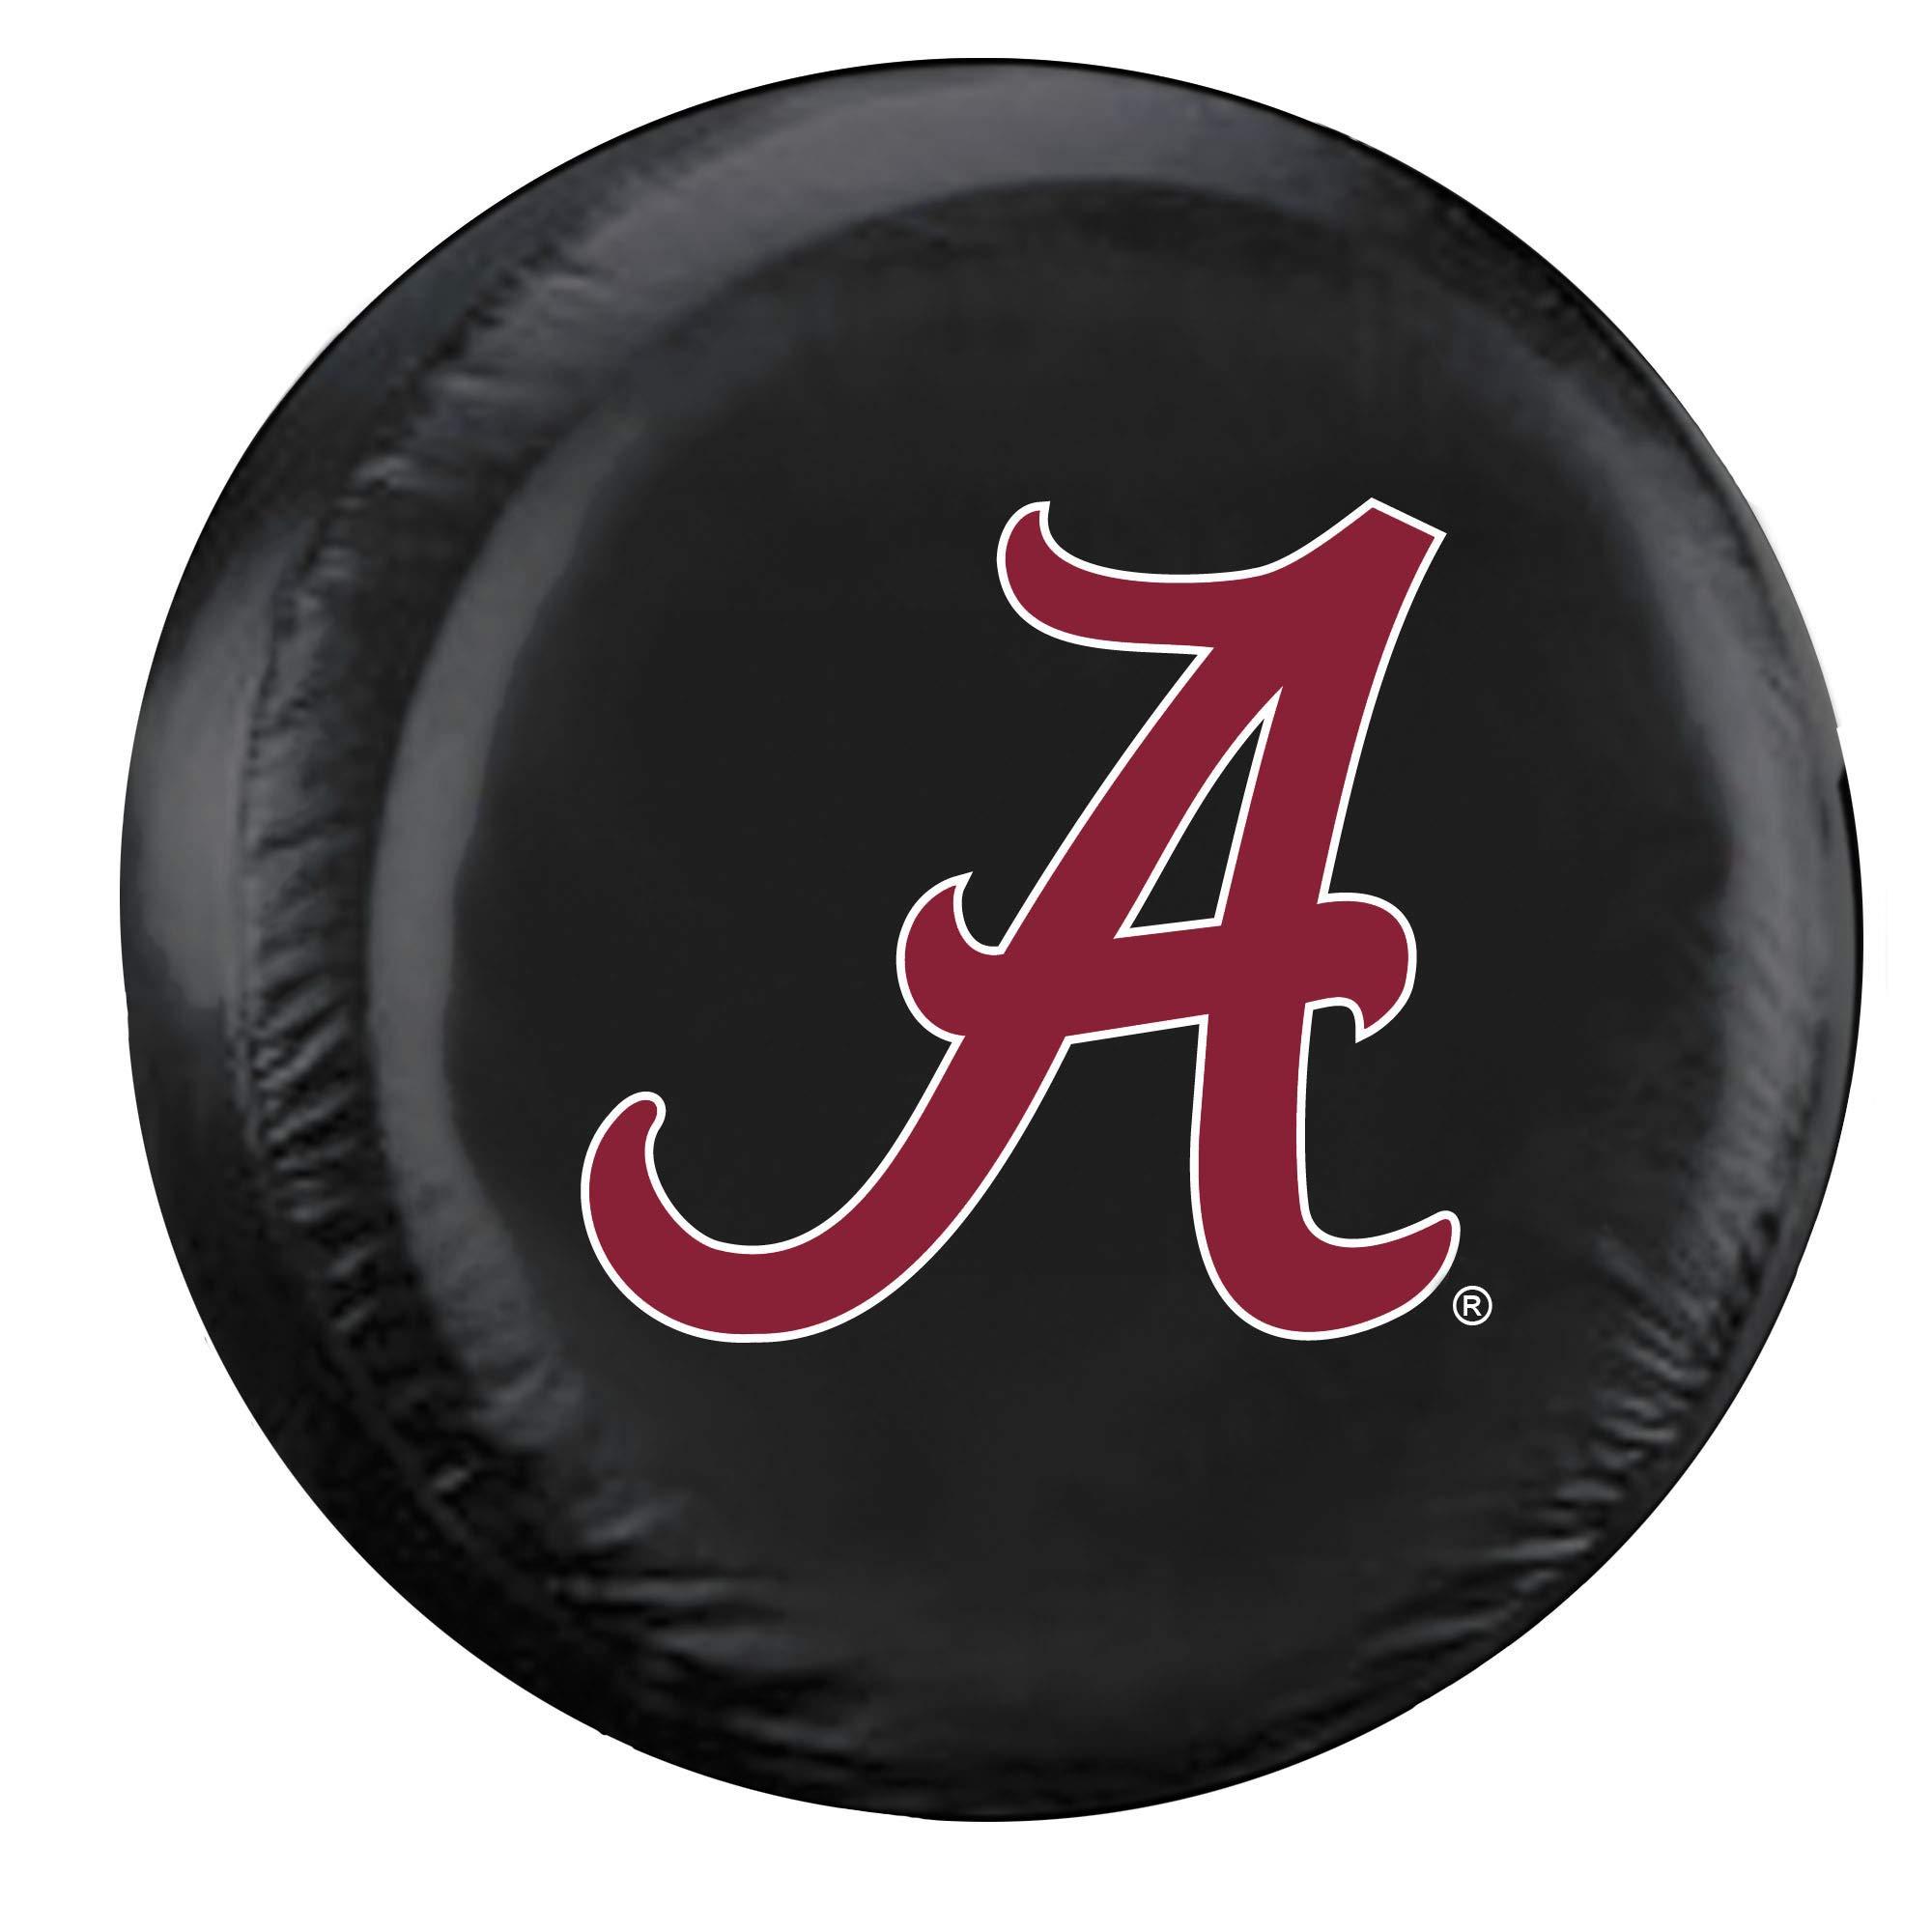 Fremont Die NCAA Alabama Crimson Tide Tire Cover, Standard Size (27-29'' Diameter)